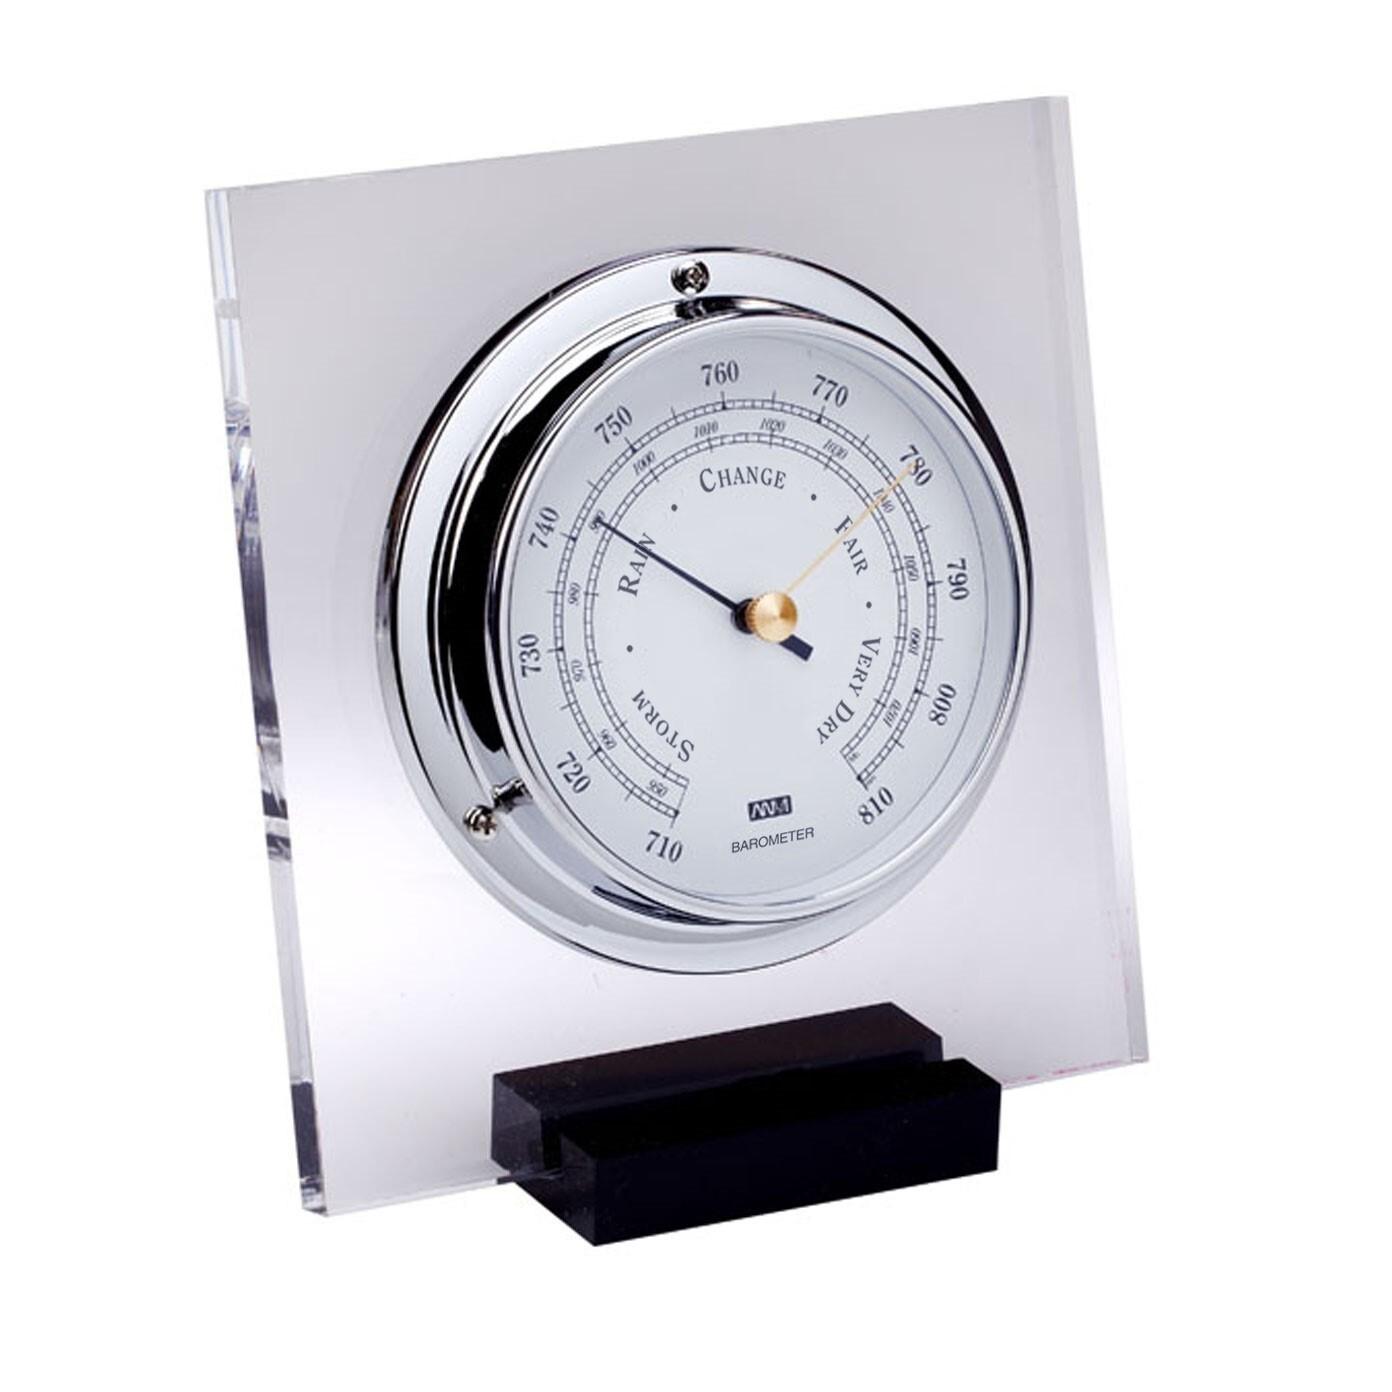 ANVI 30.0431 Barometer - Chrome Plexiglas - Low Altitude